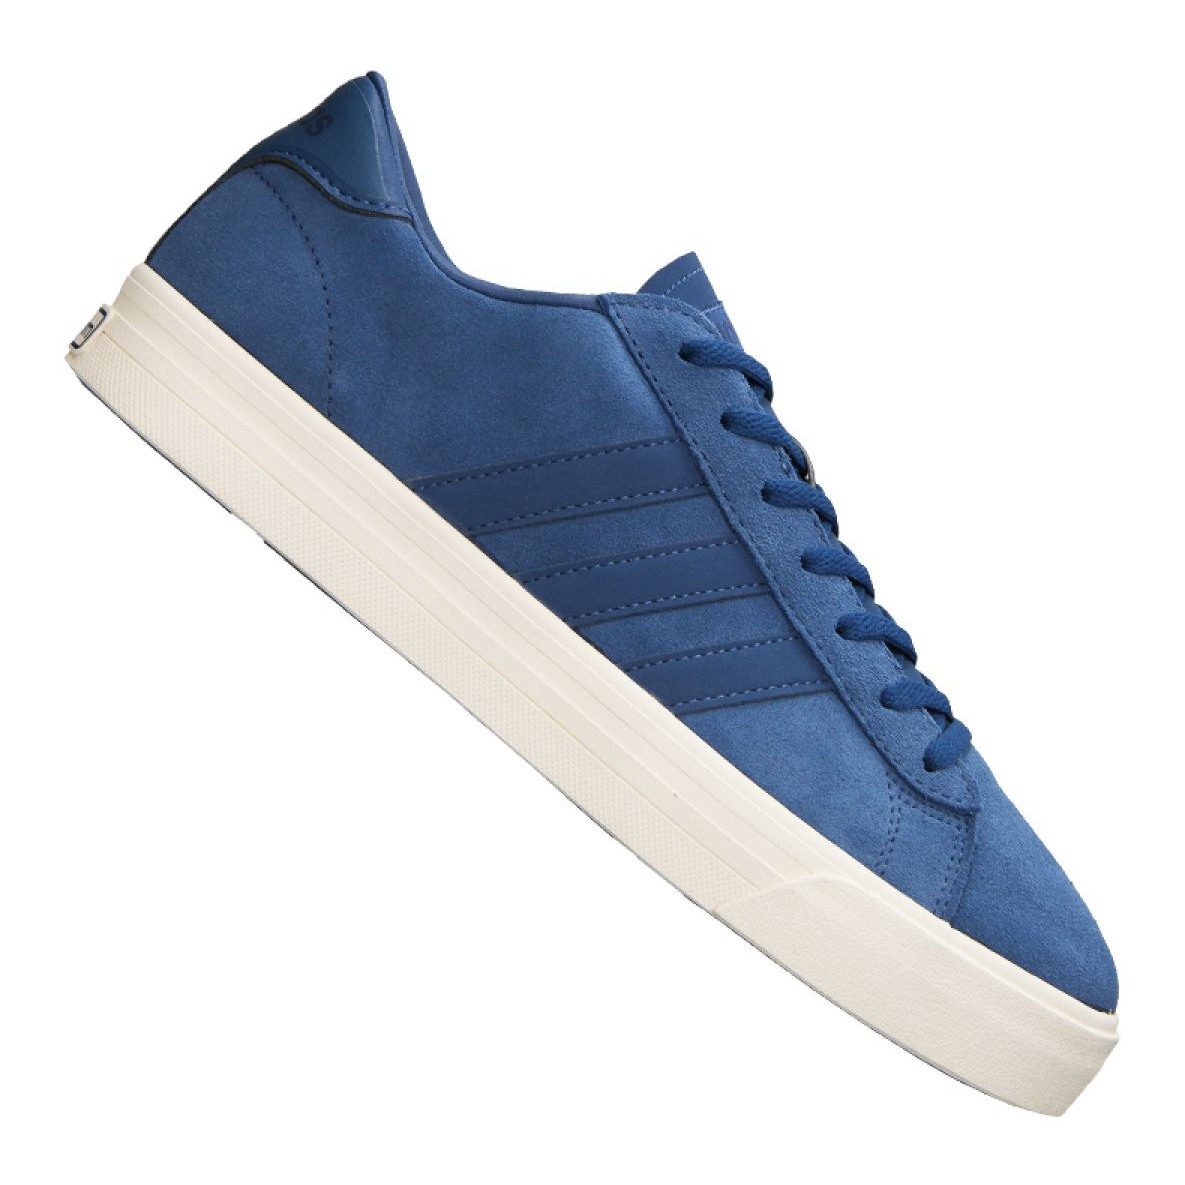 Adidas Cloudfoam Super Daily M AW3904